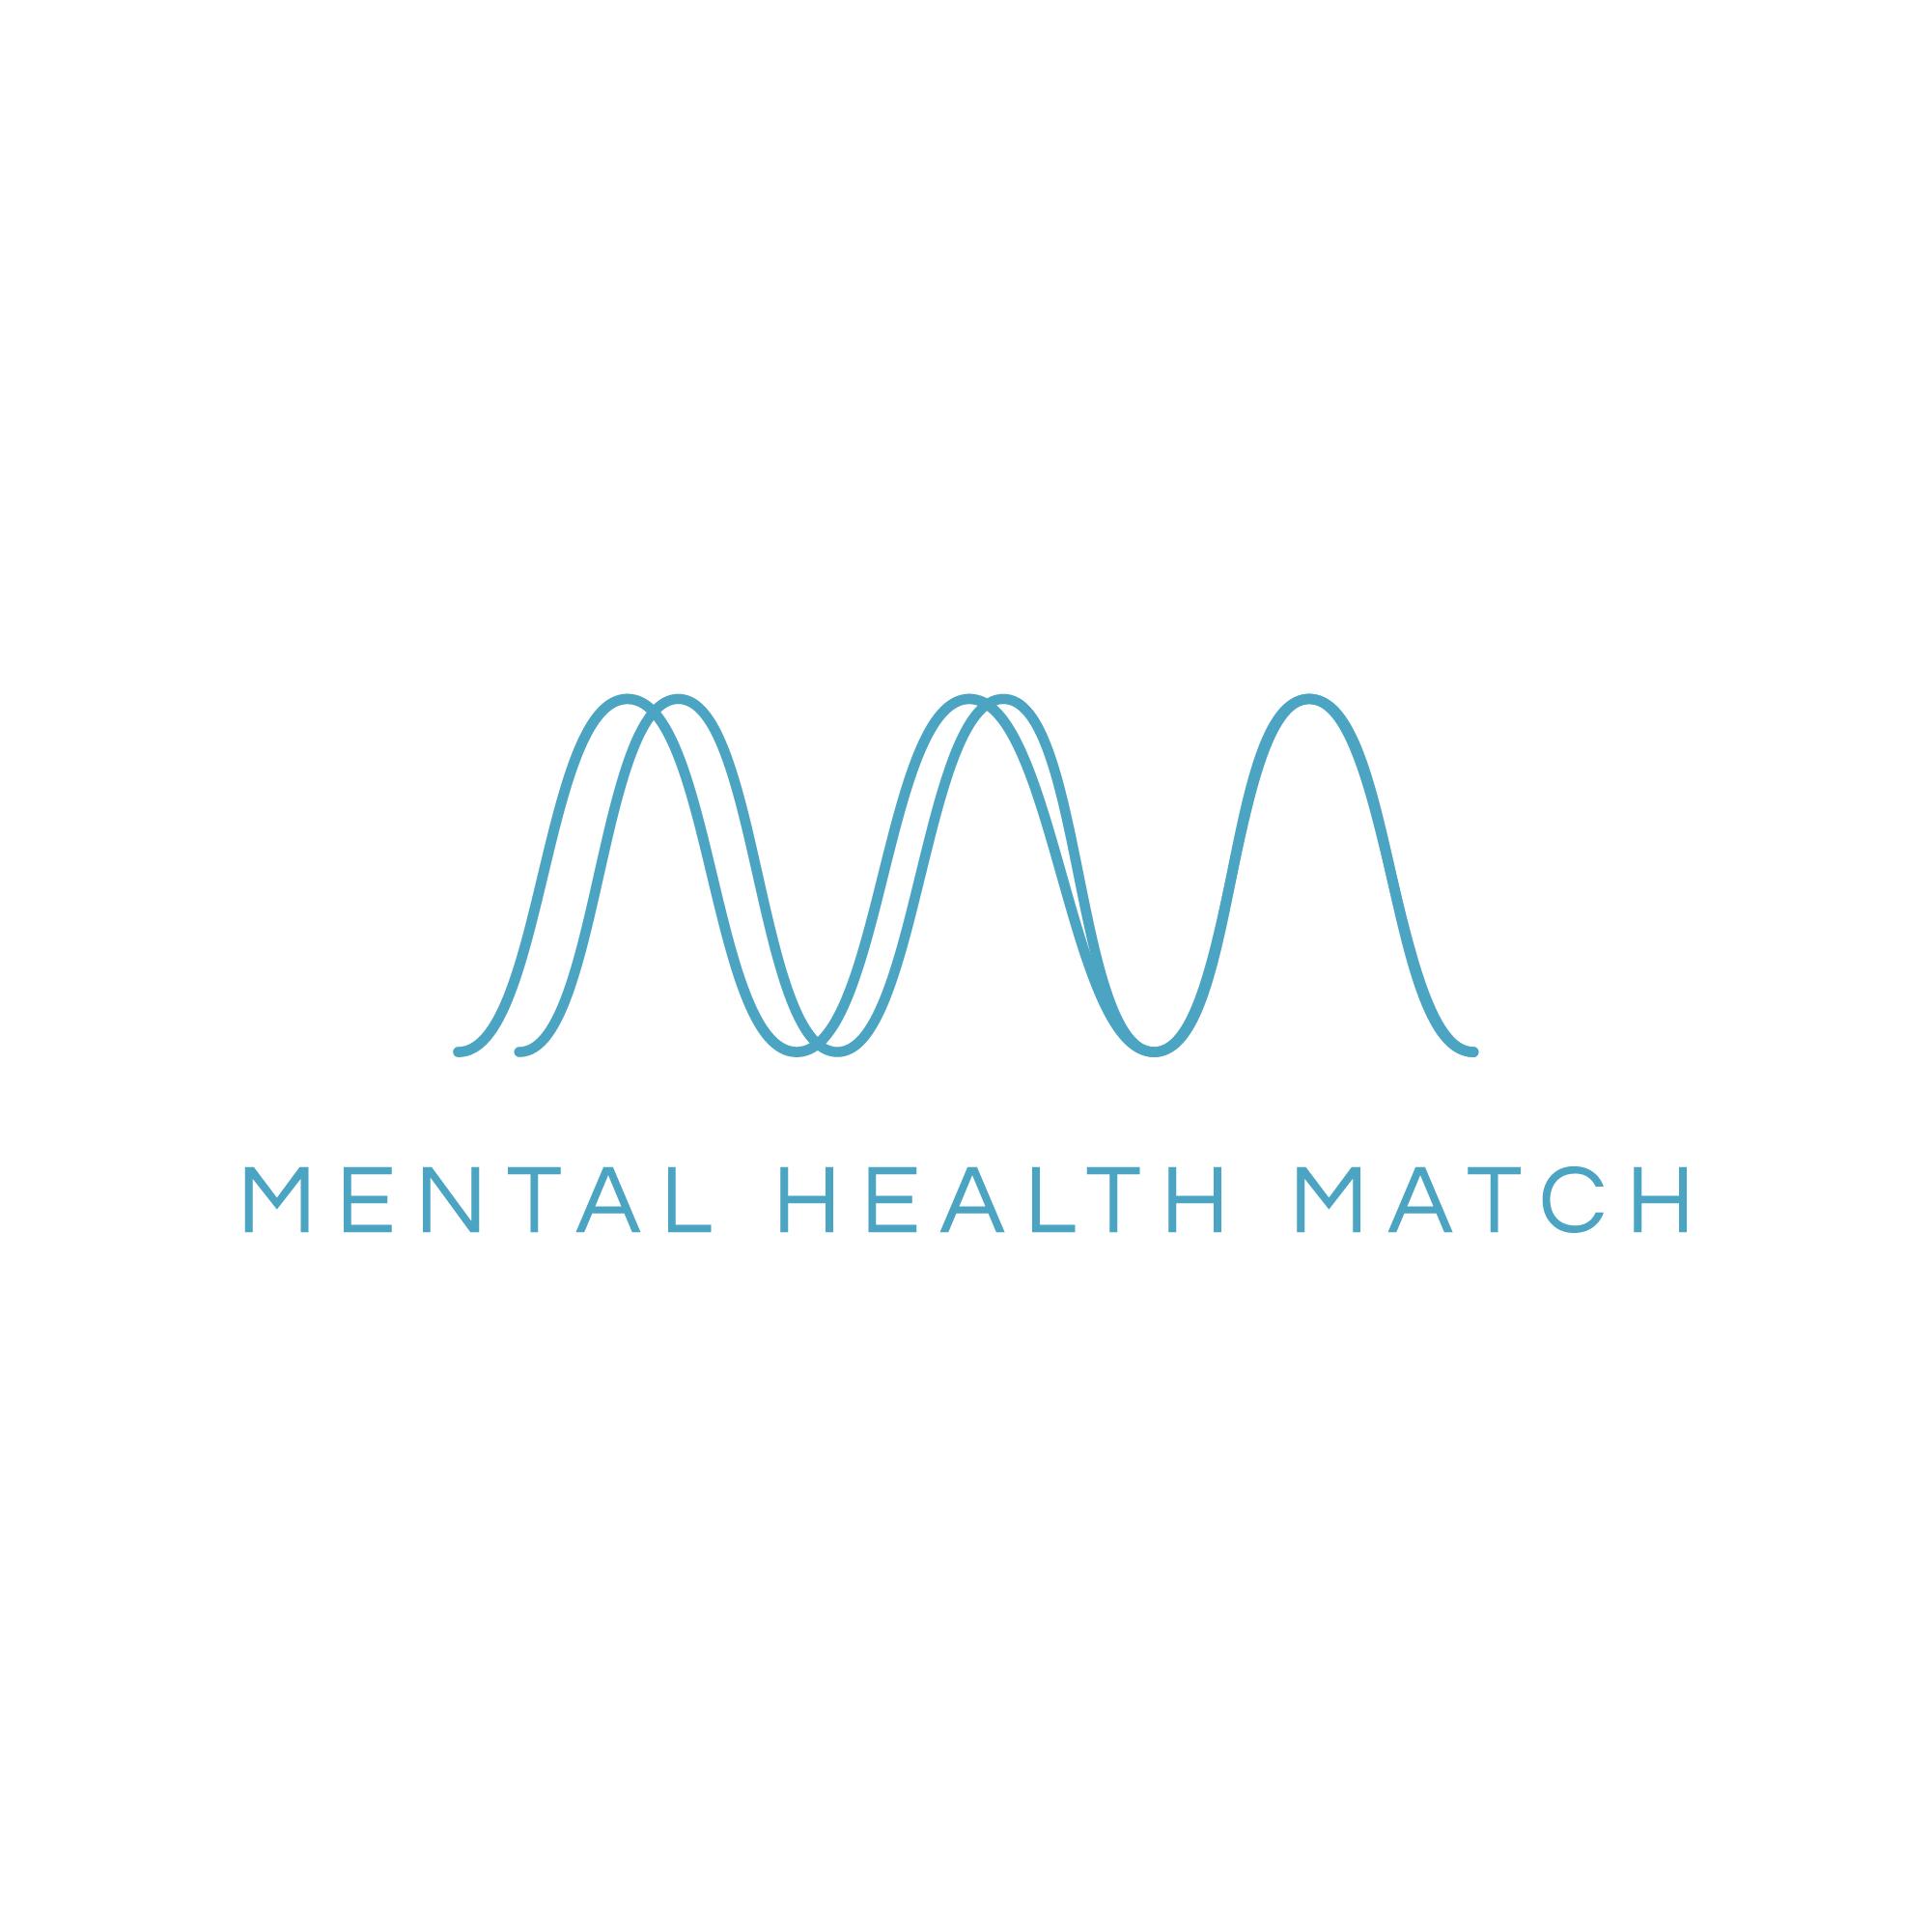 Finka_Studio_Logo_Mental_Health_Match.png